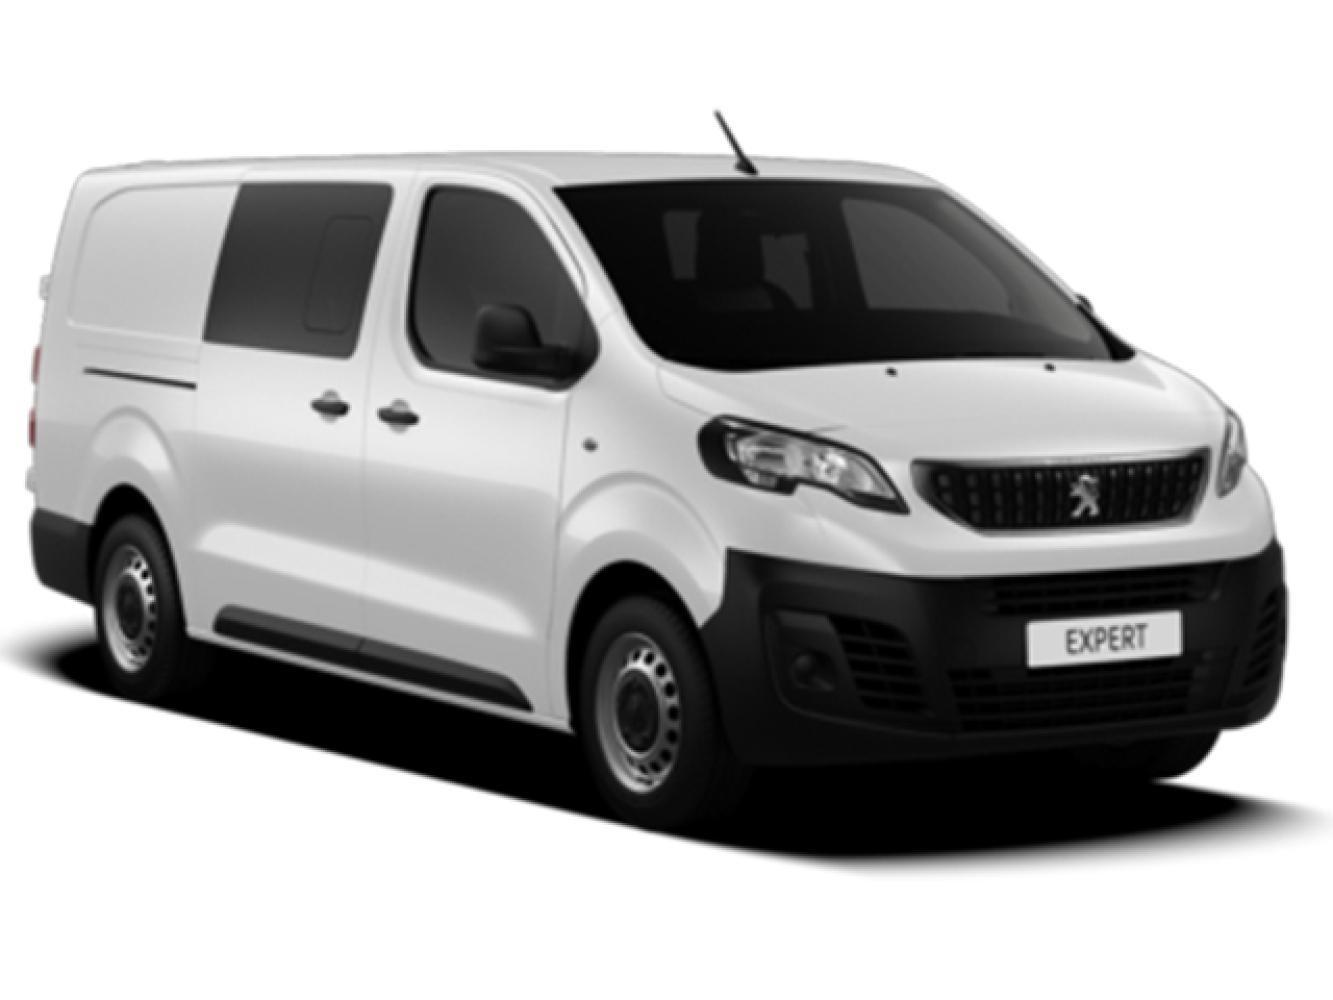 New Peugeot Expert Standard Diesel 1400 2 0 Bluehdi 120